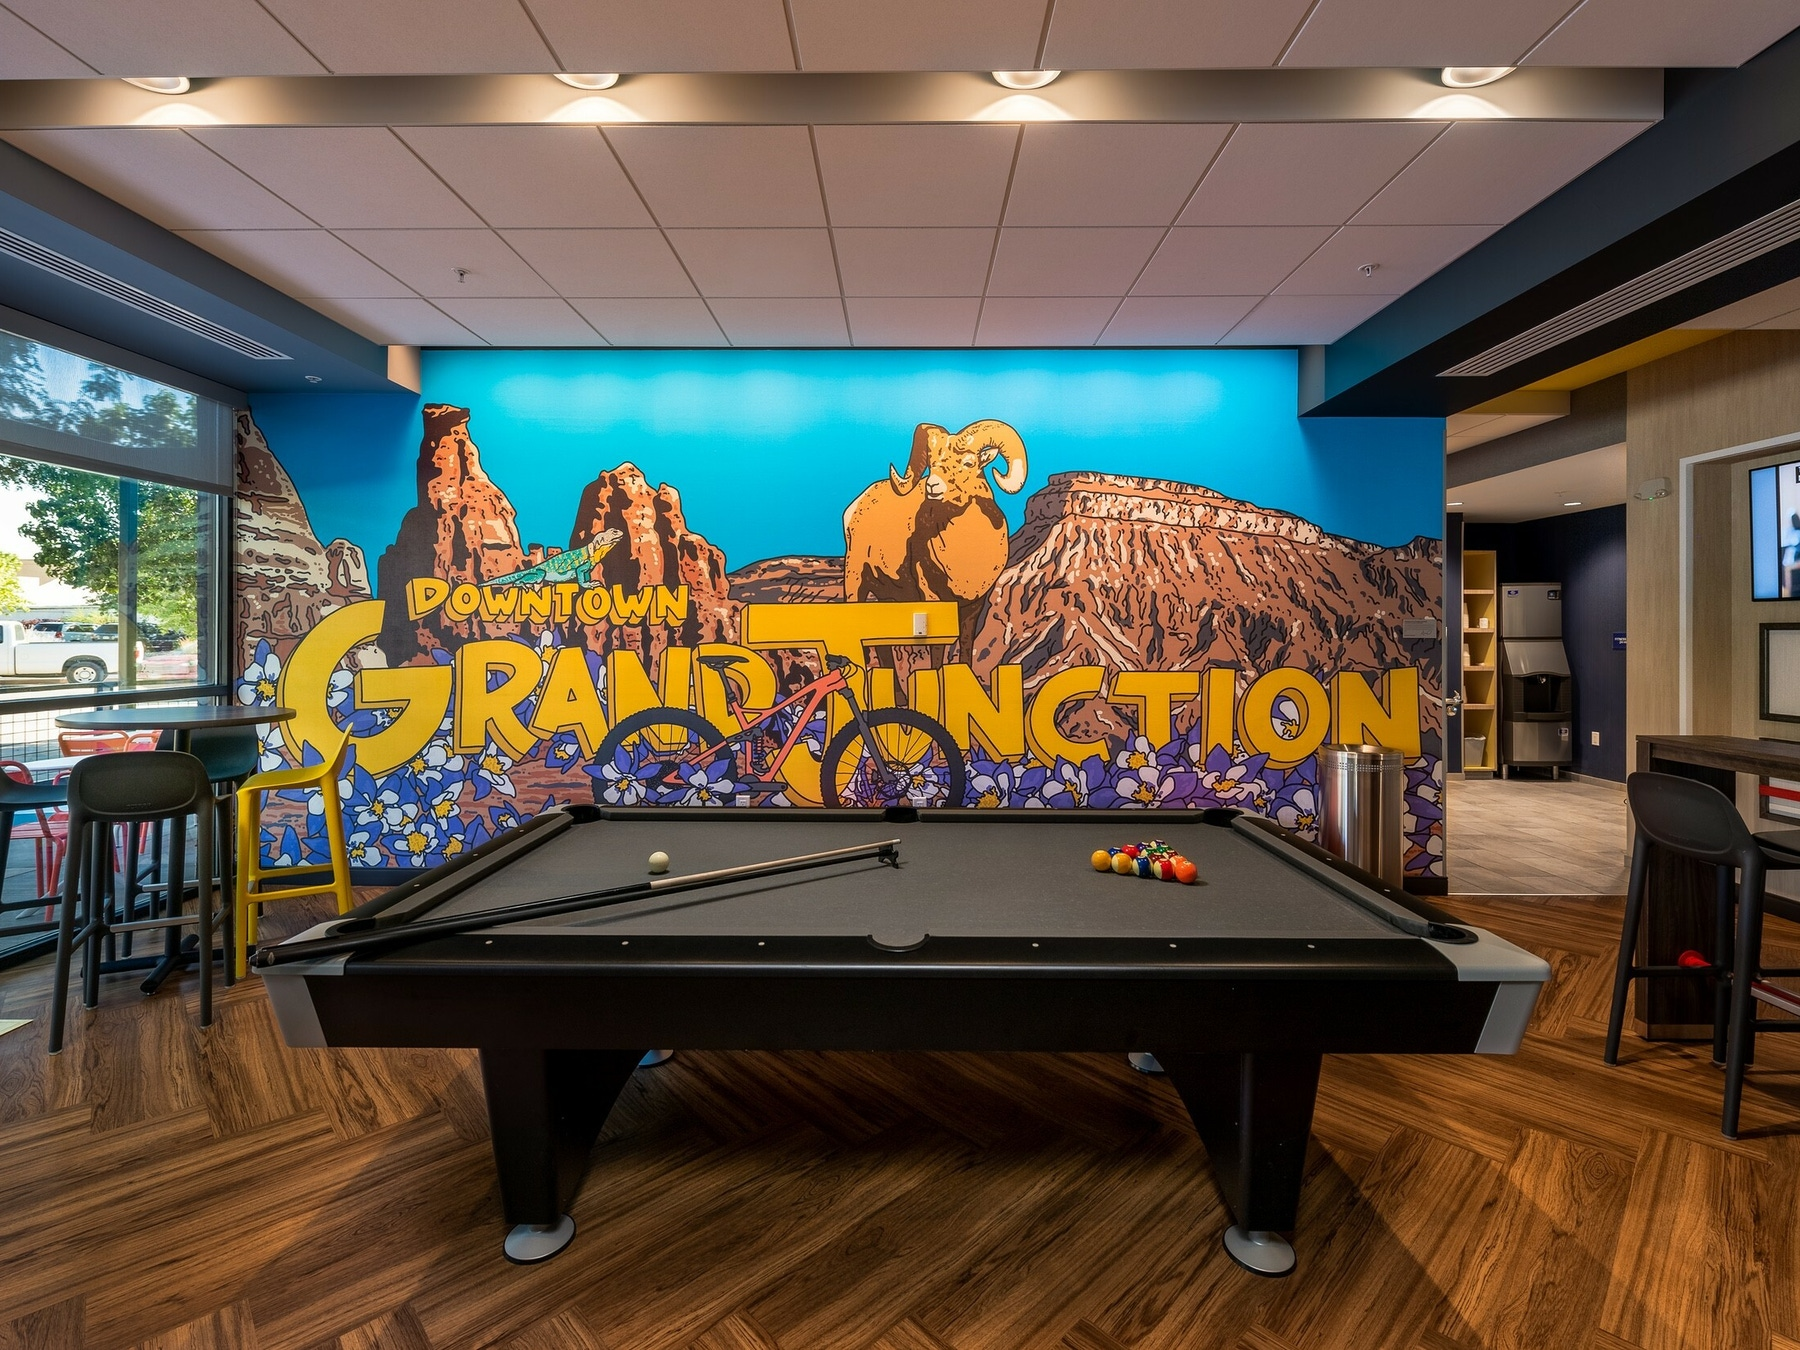 JR SHAW Tru Grand Junction 3